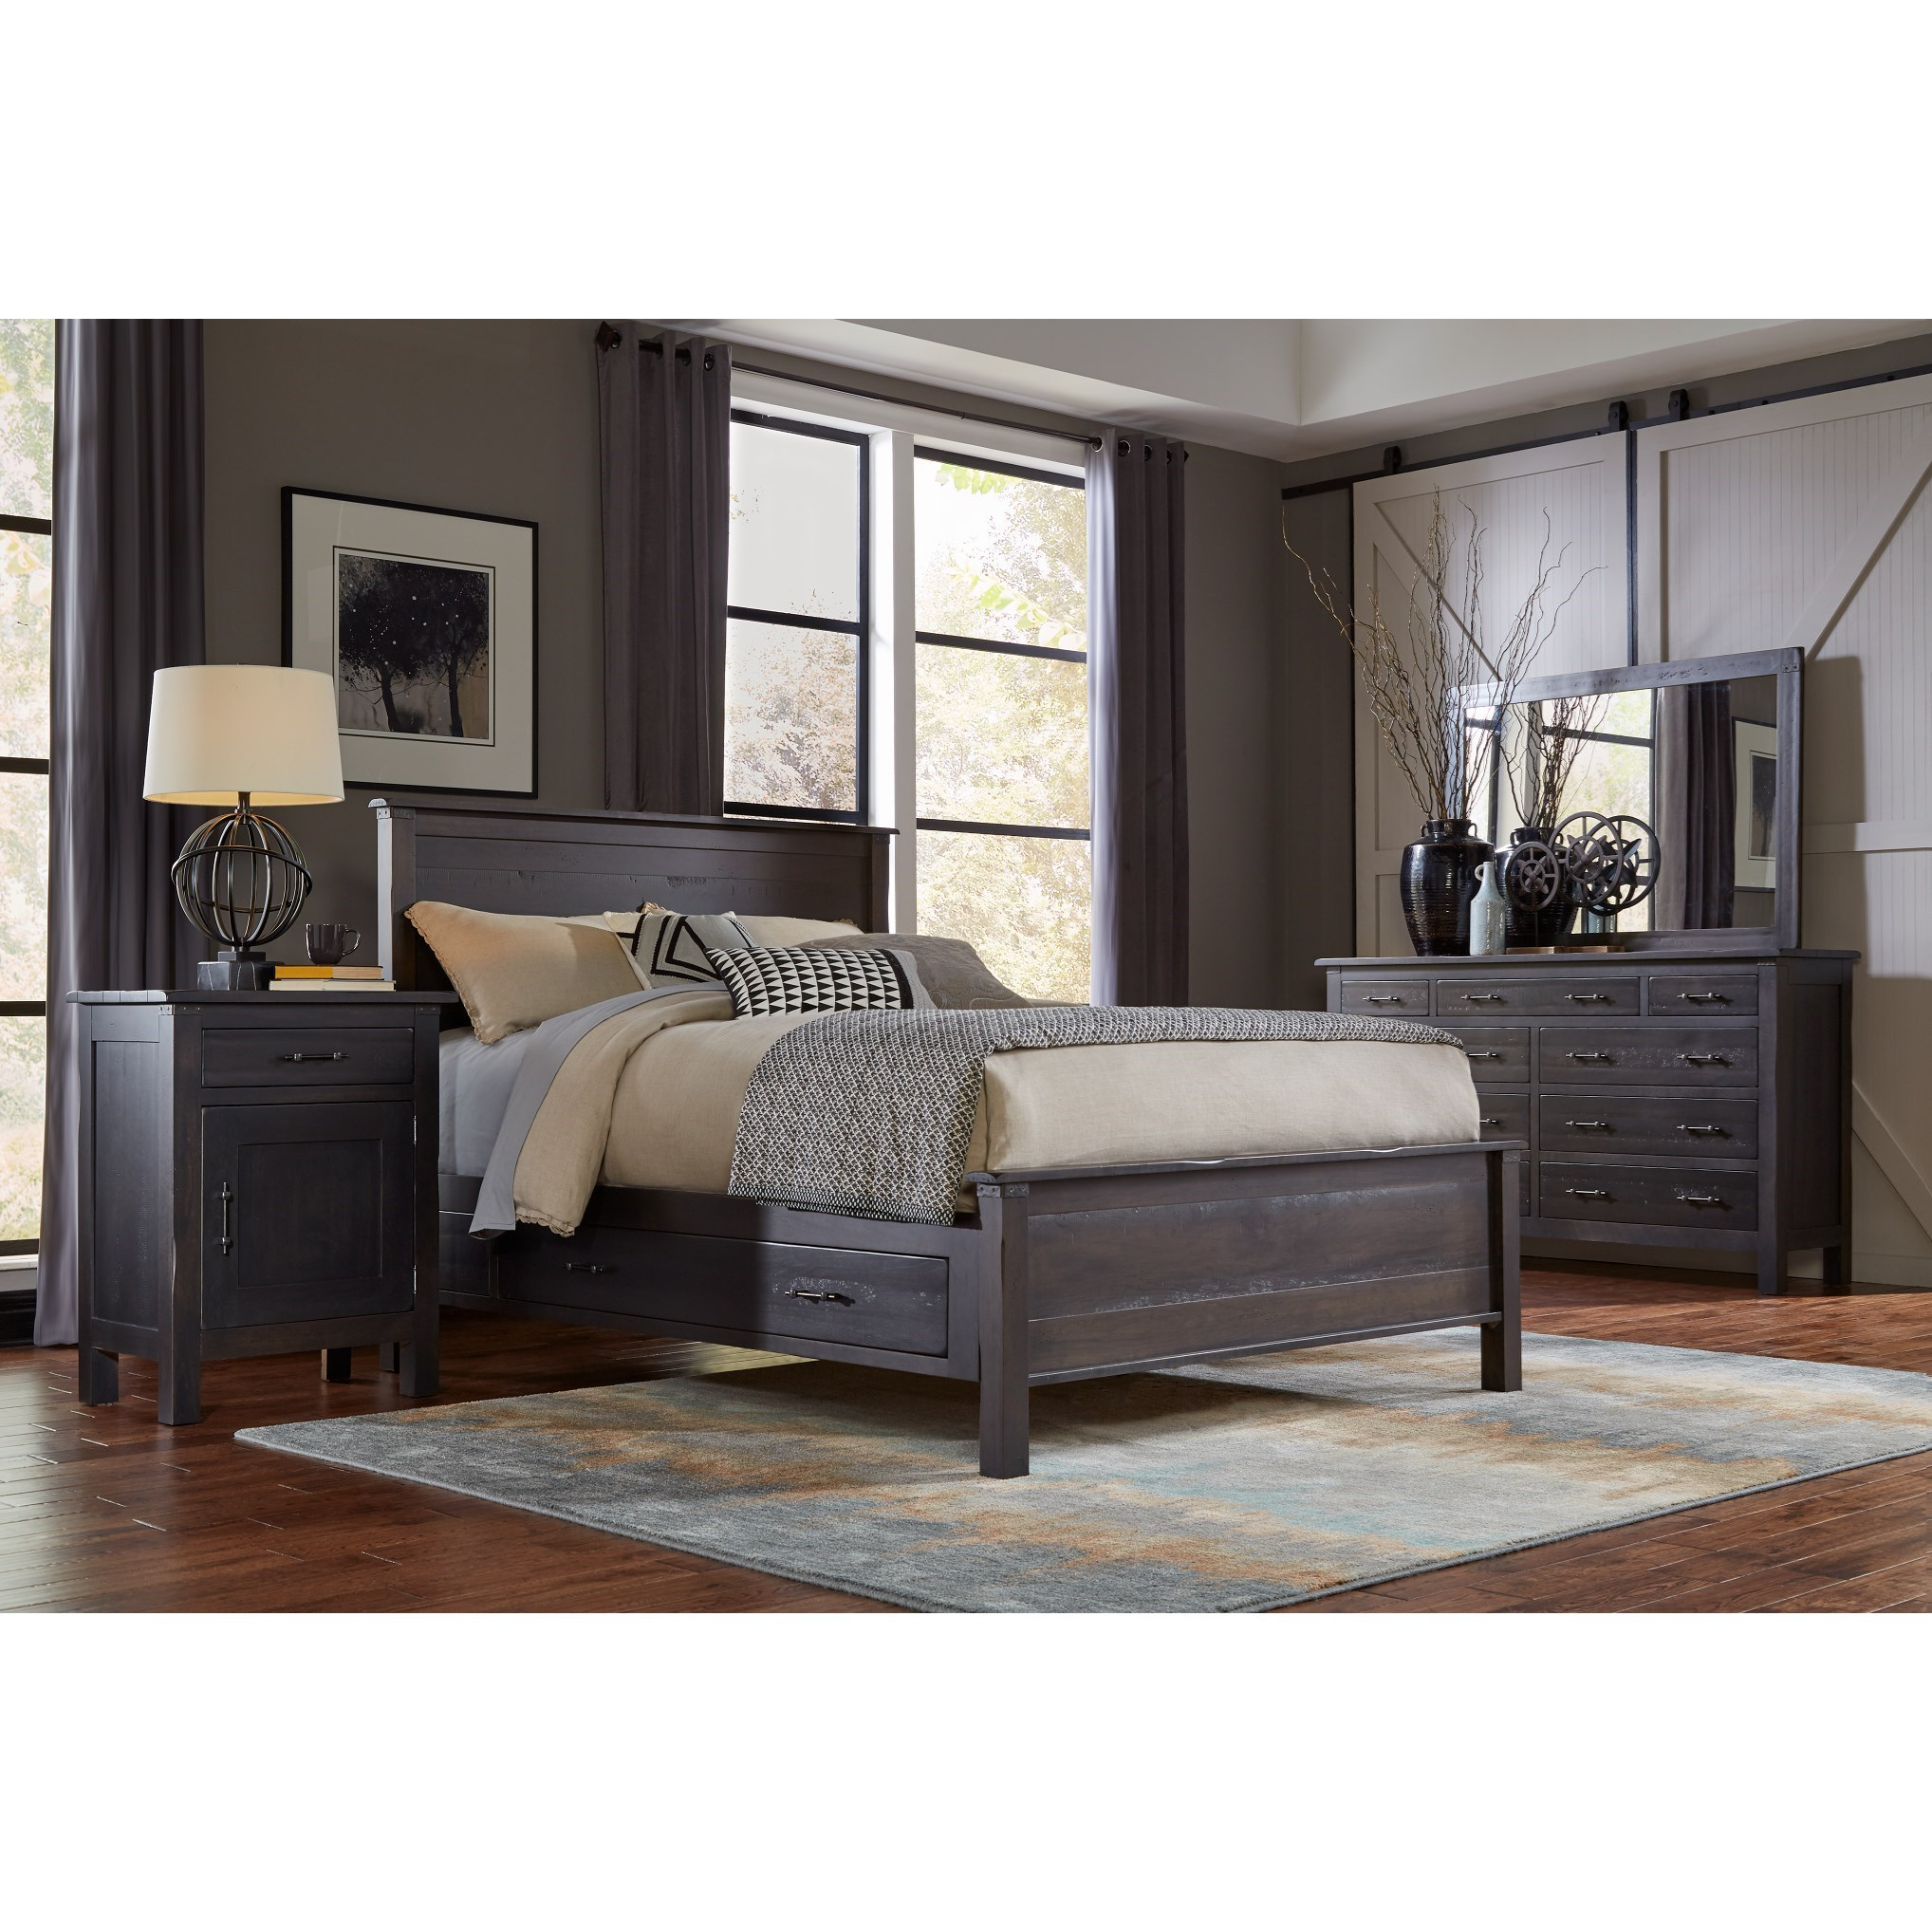 Amish Furniture Wildwood Fl